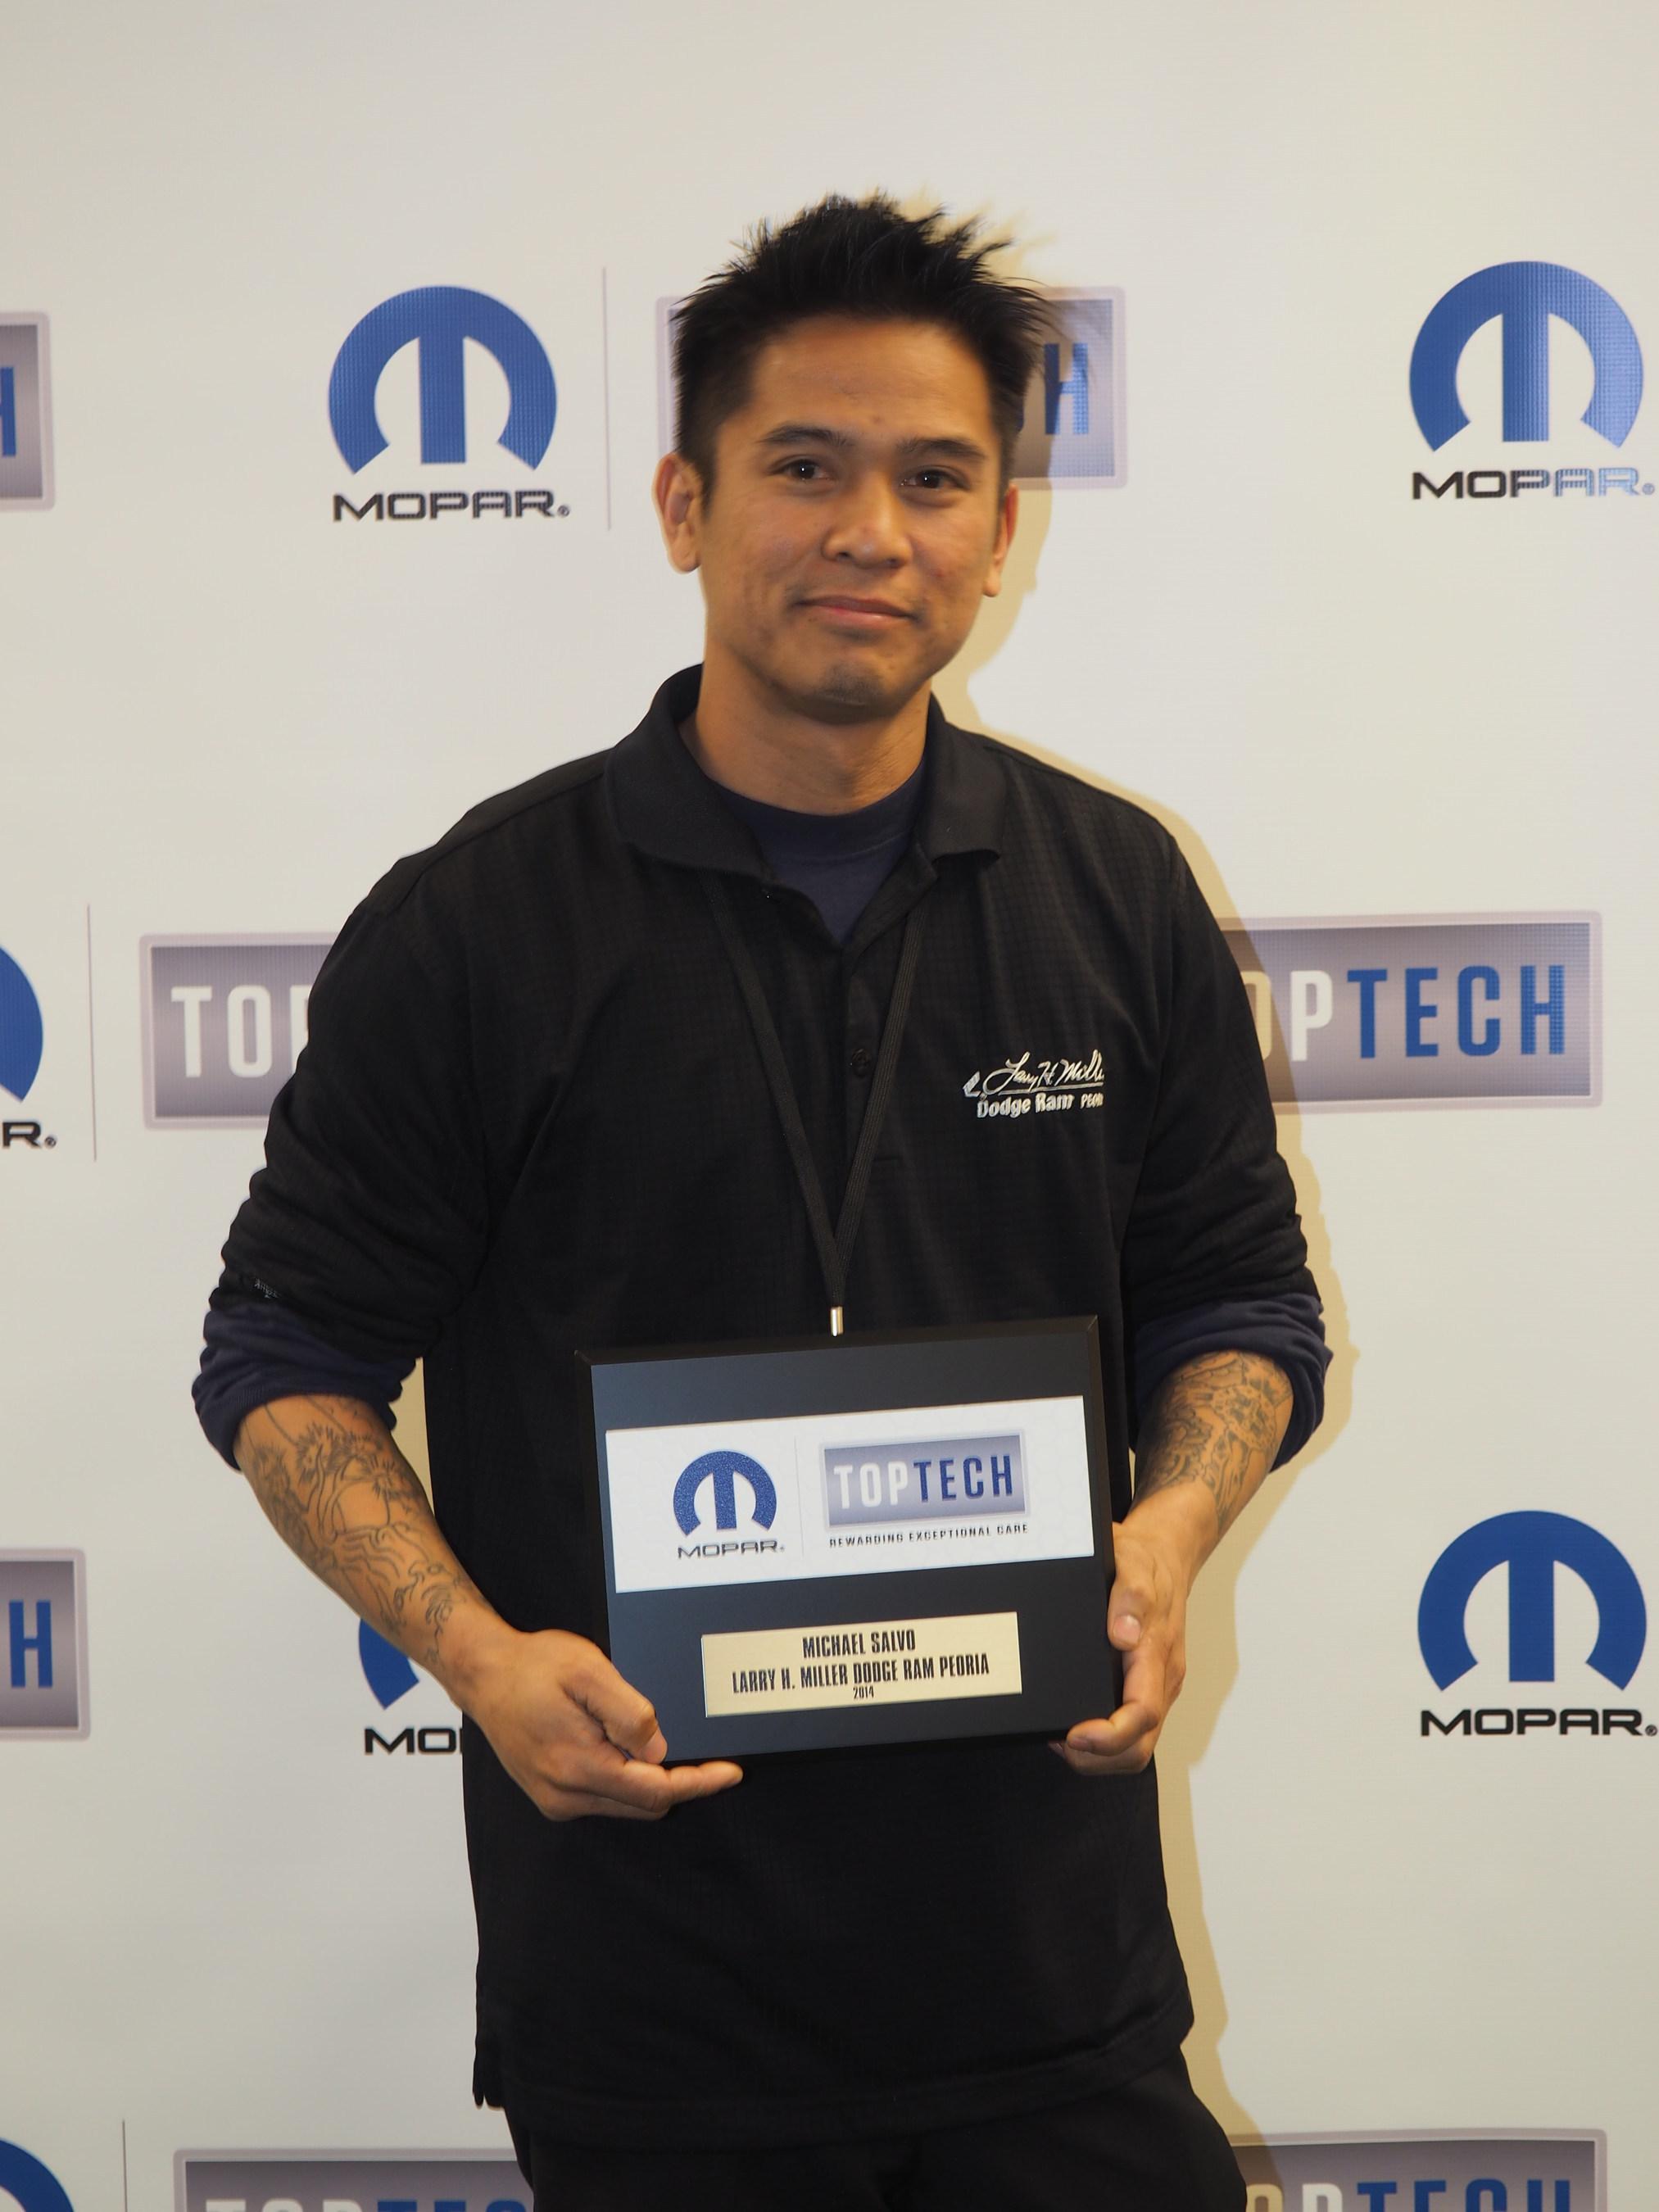 Arizona FCA US Technicians Salvo and Serra Earn Mopar Top Tech Honors